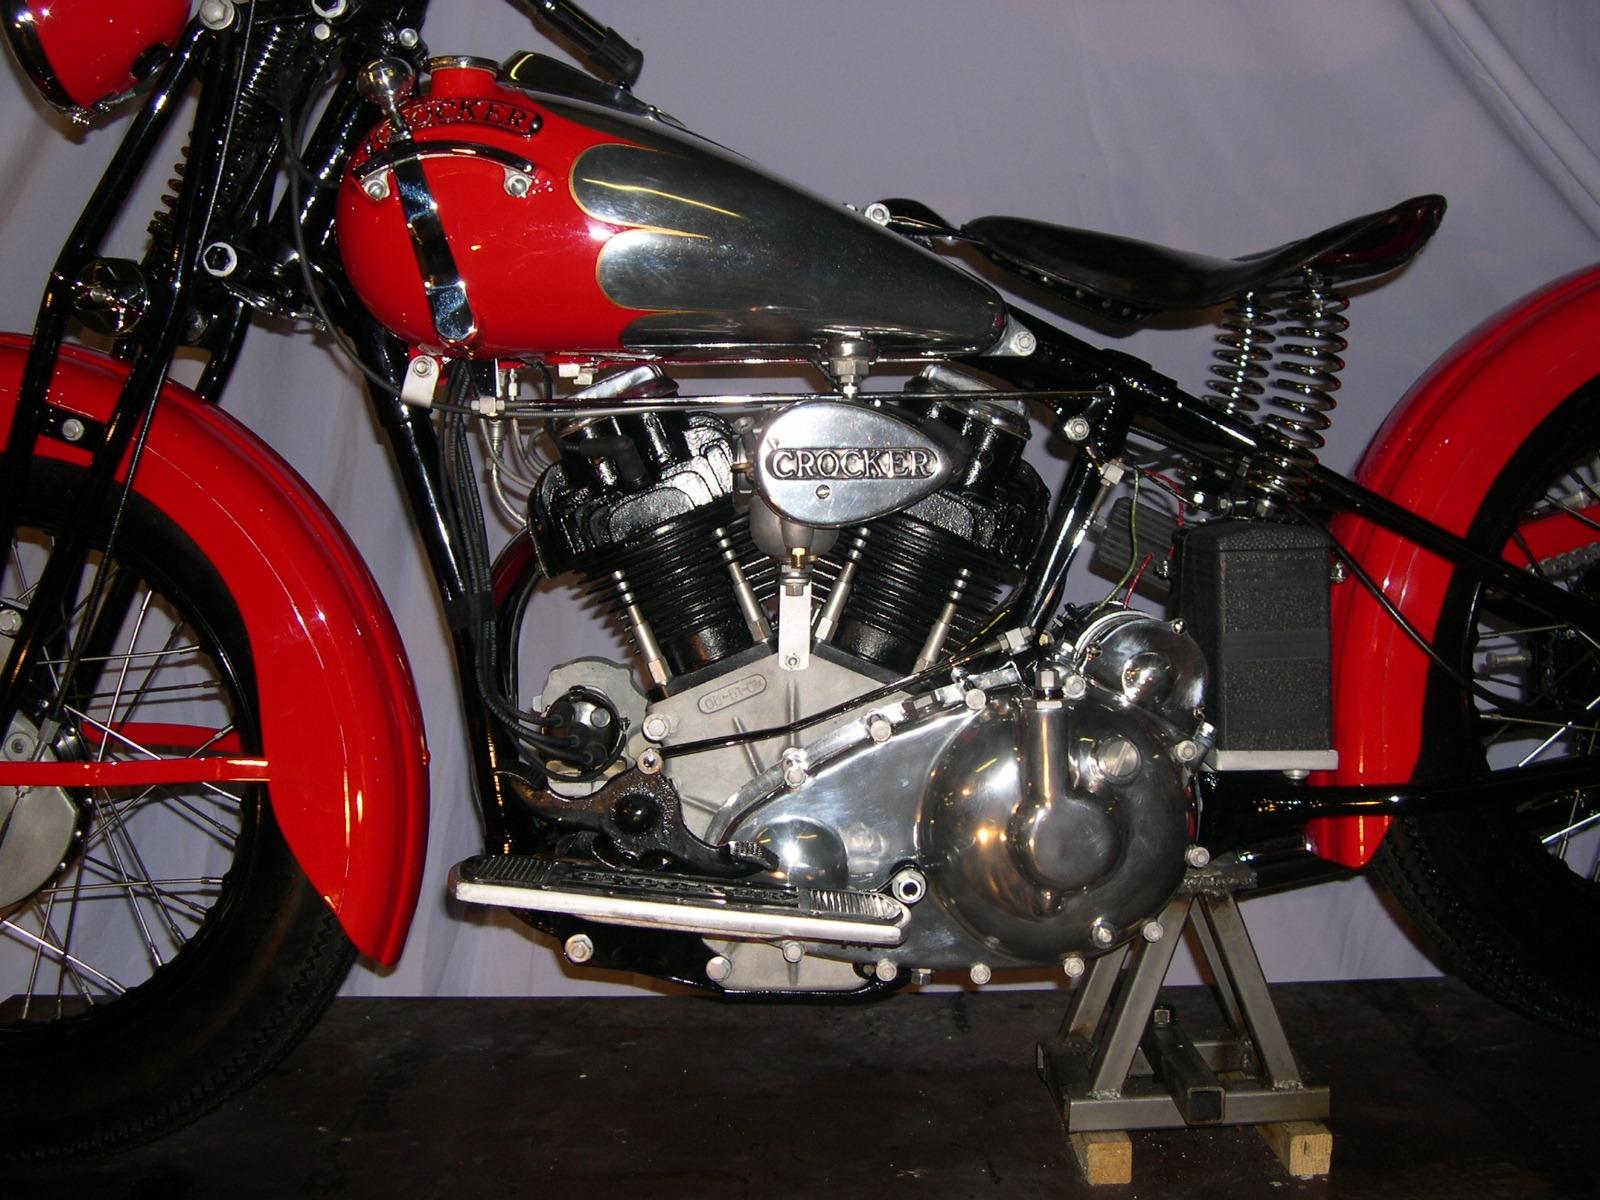 New Crocker Big Tank Motorcycle